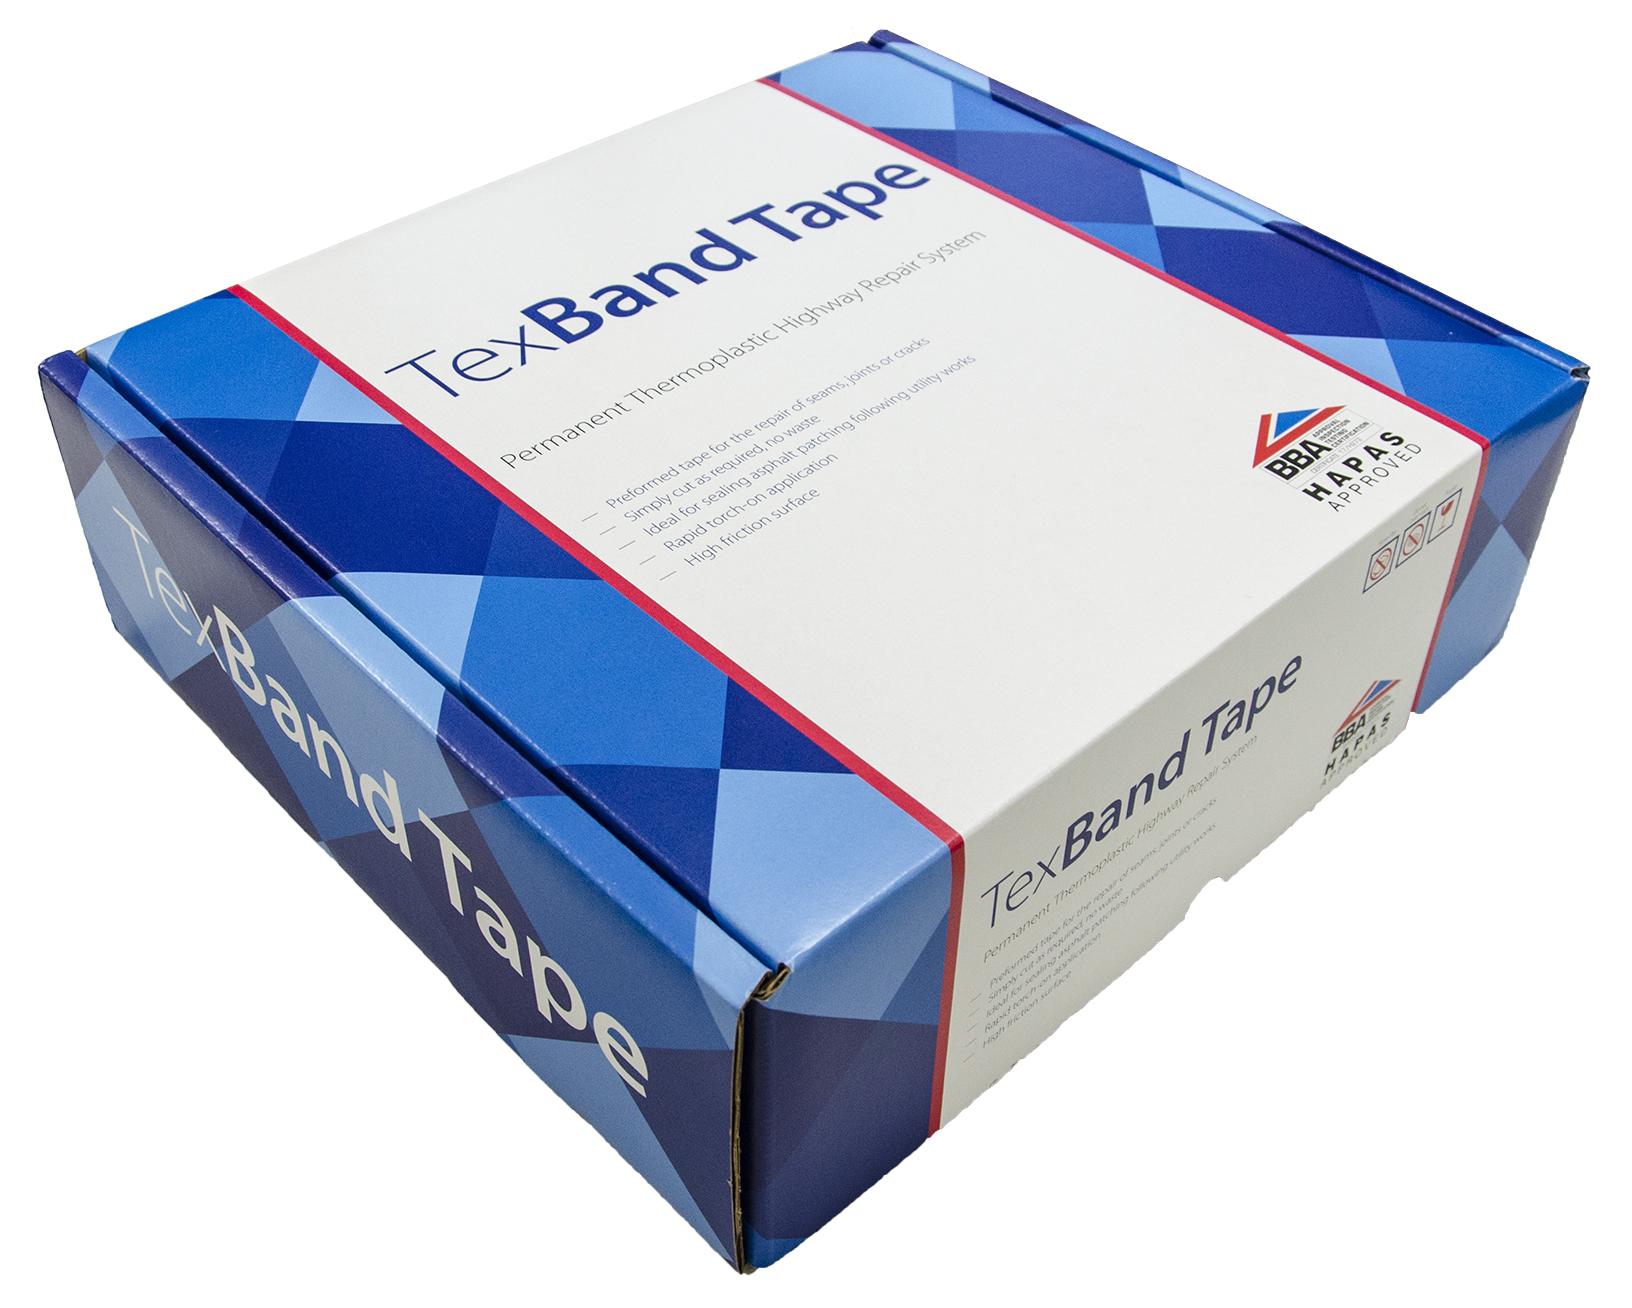 TexBand Overbanding Tape